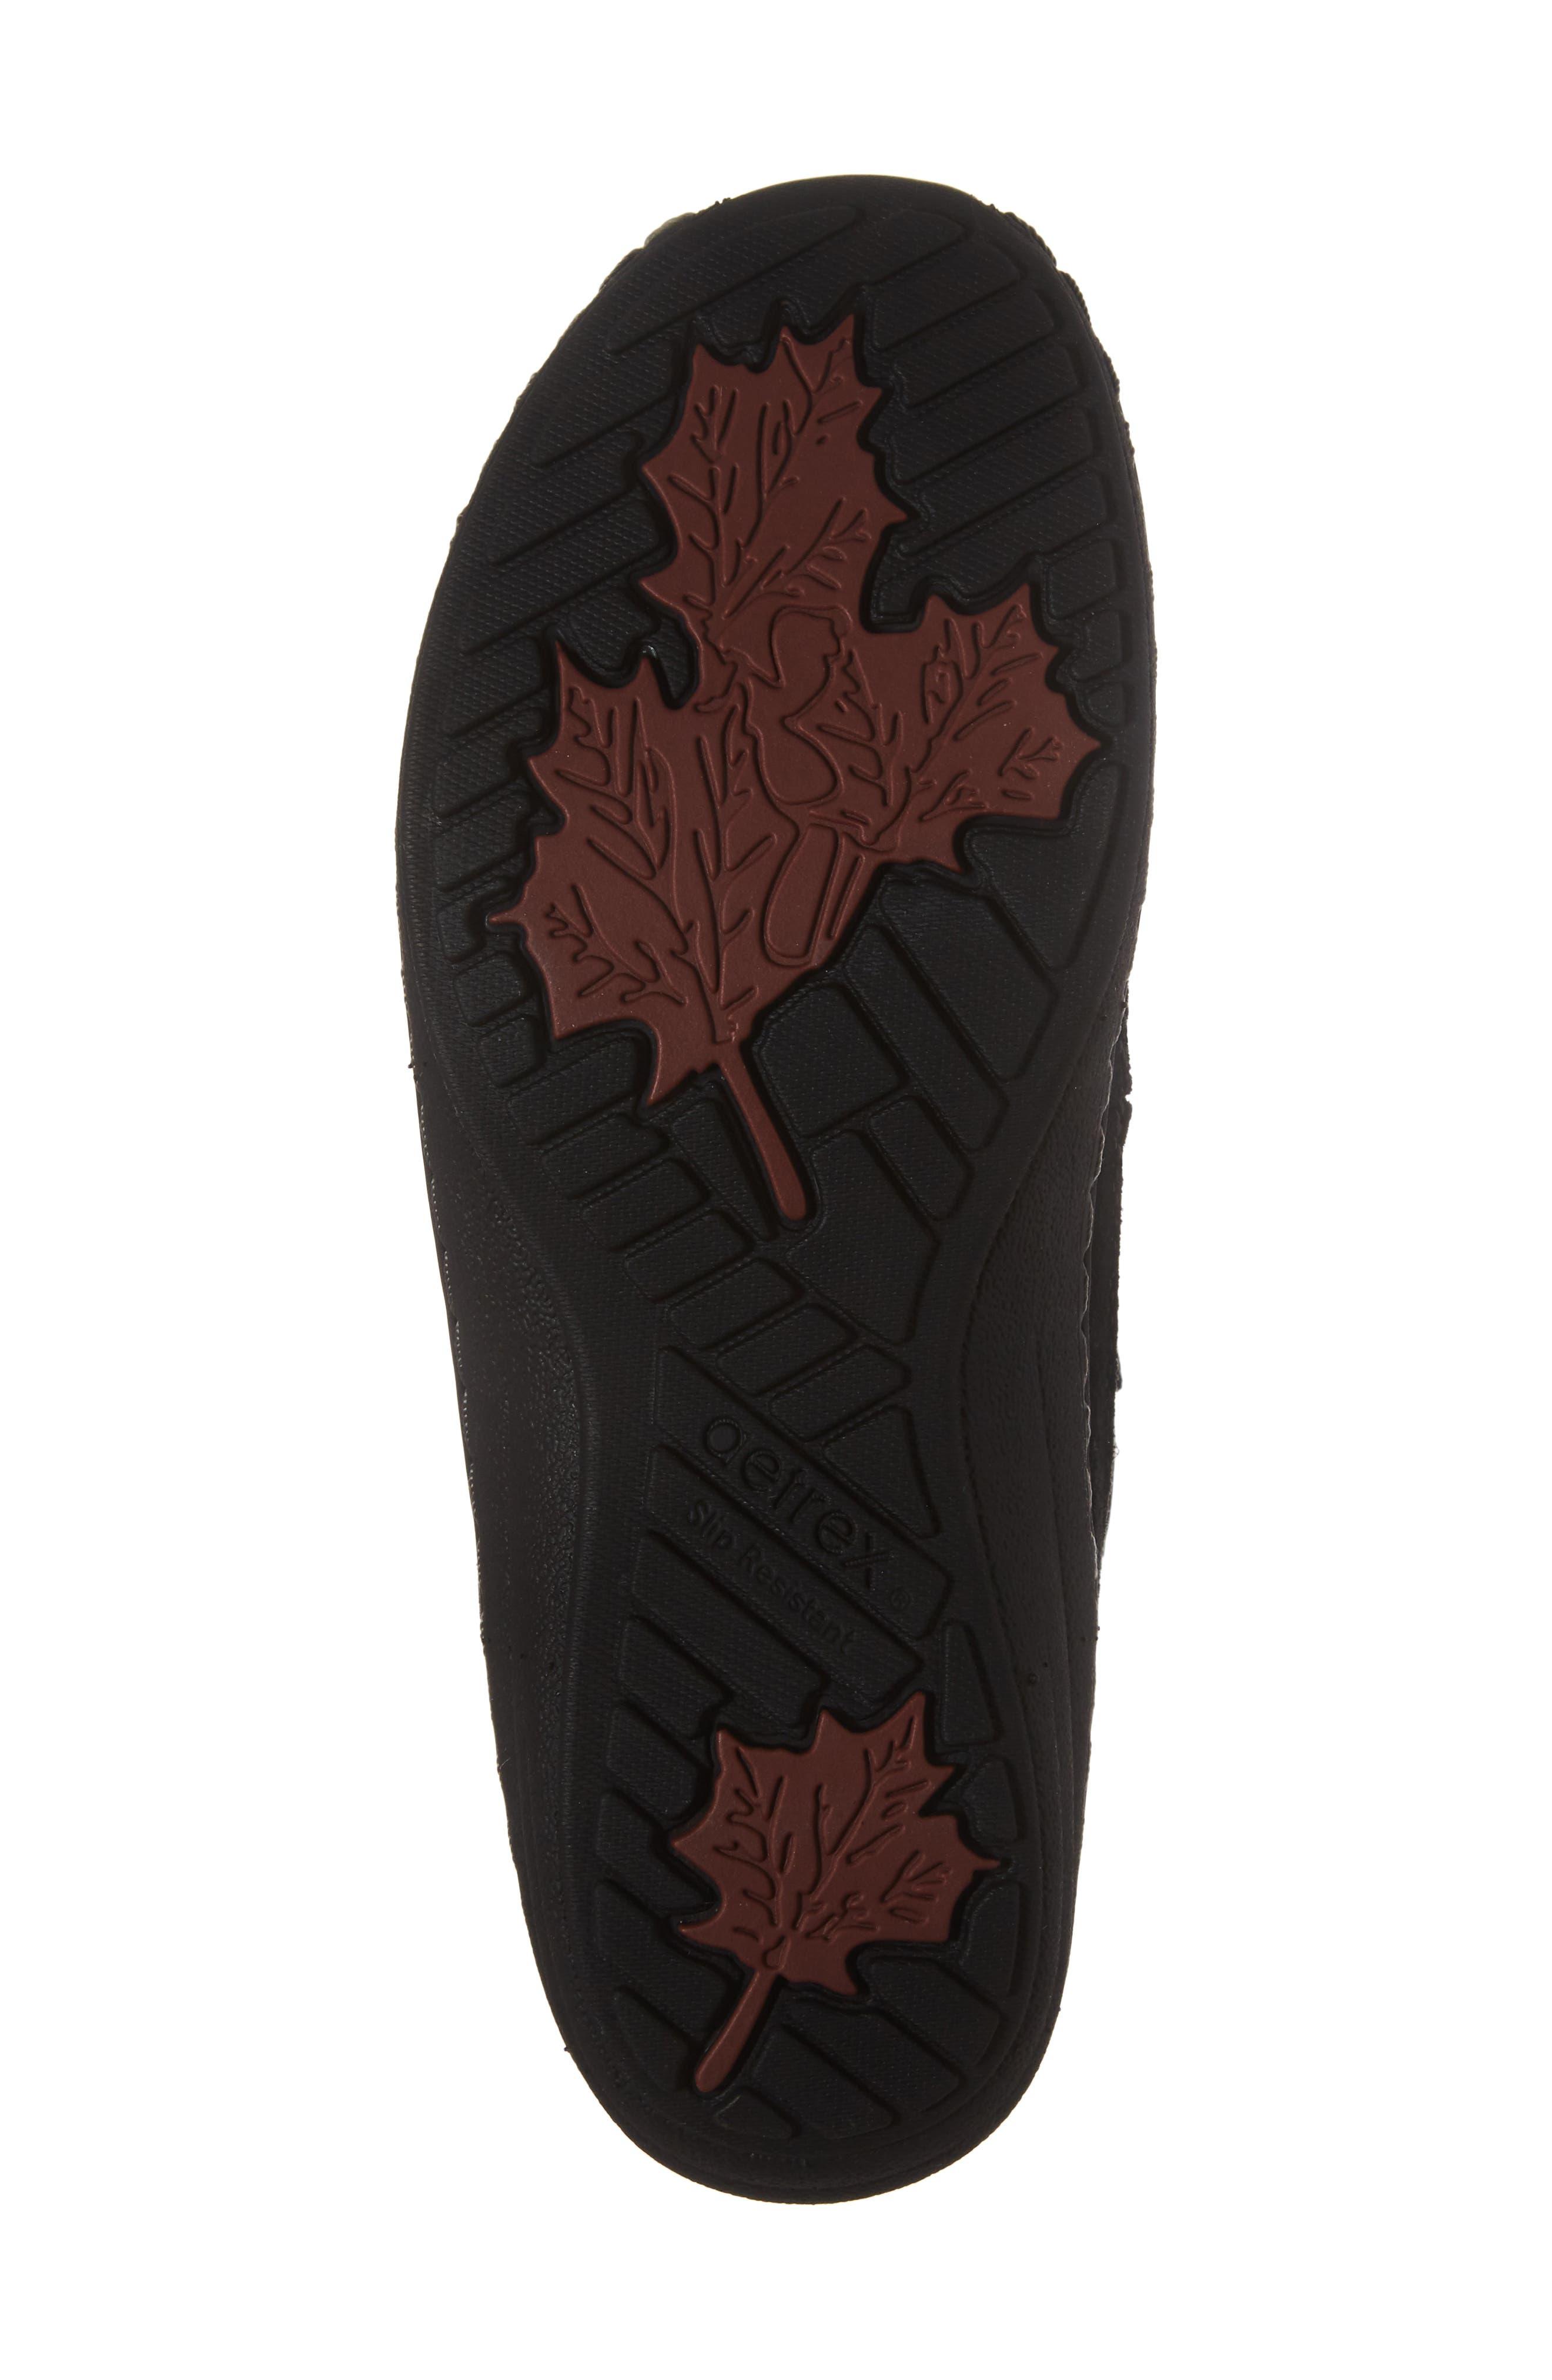 Berries Water Resistant Boot,                             Alternate thumbnail 6, color,                             Blackberry Suede